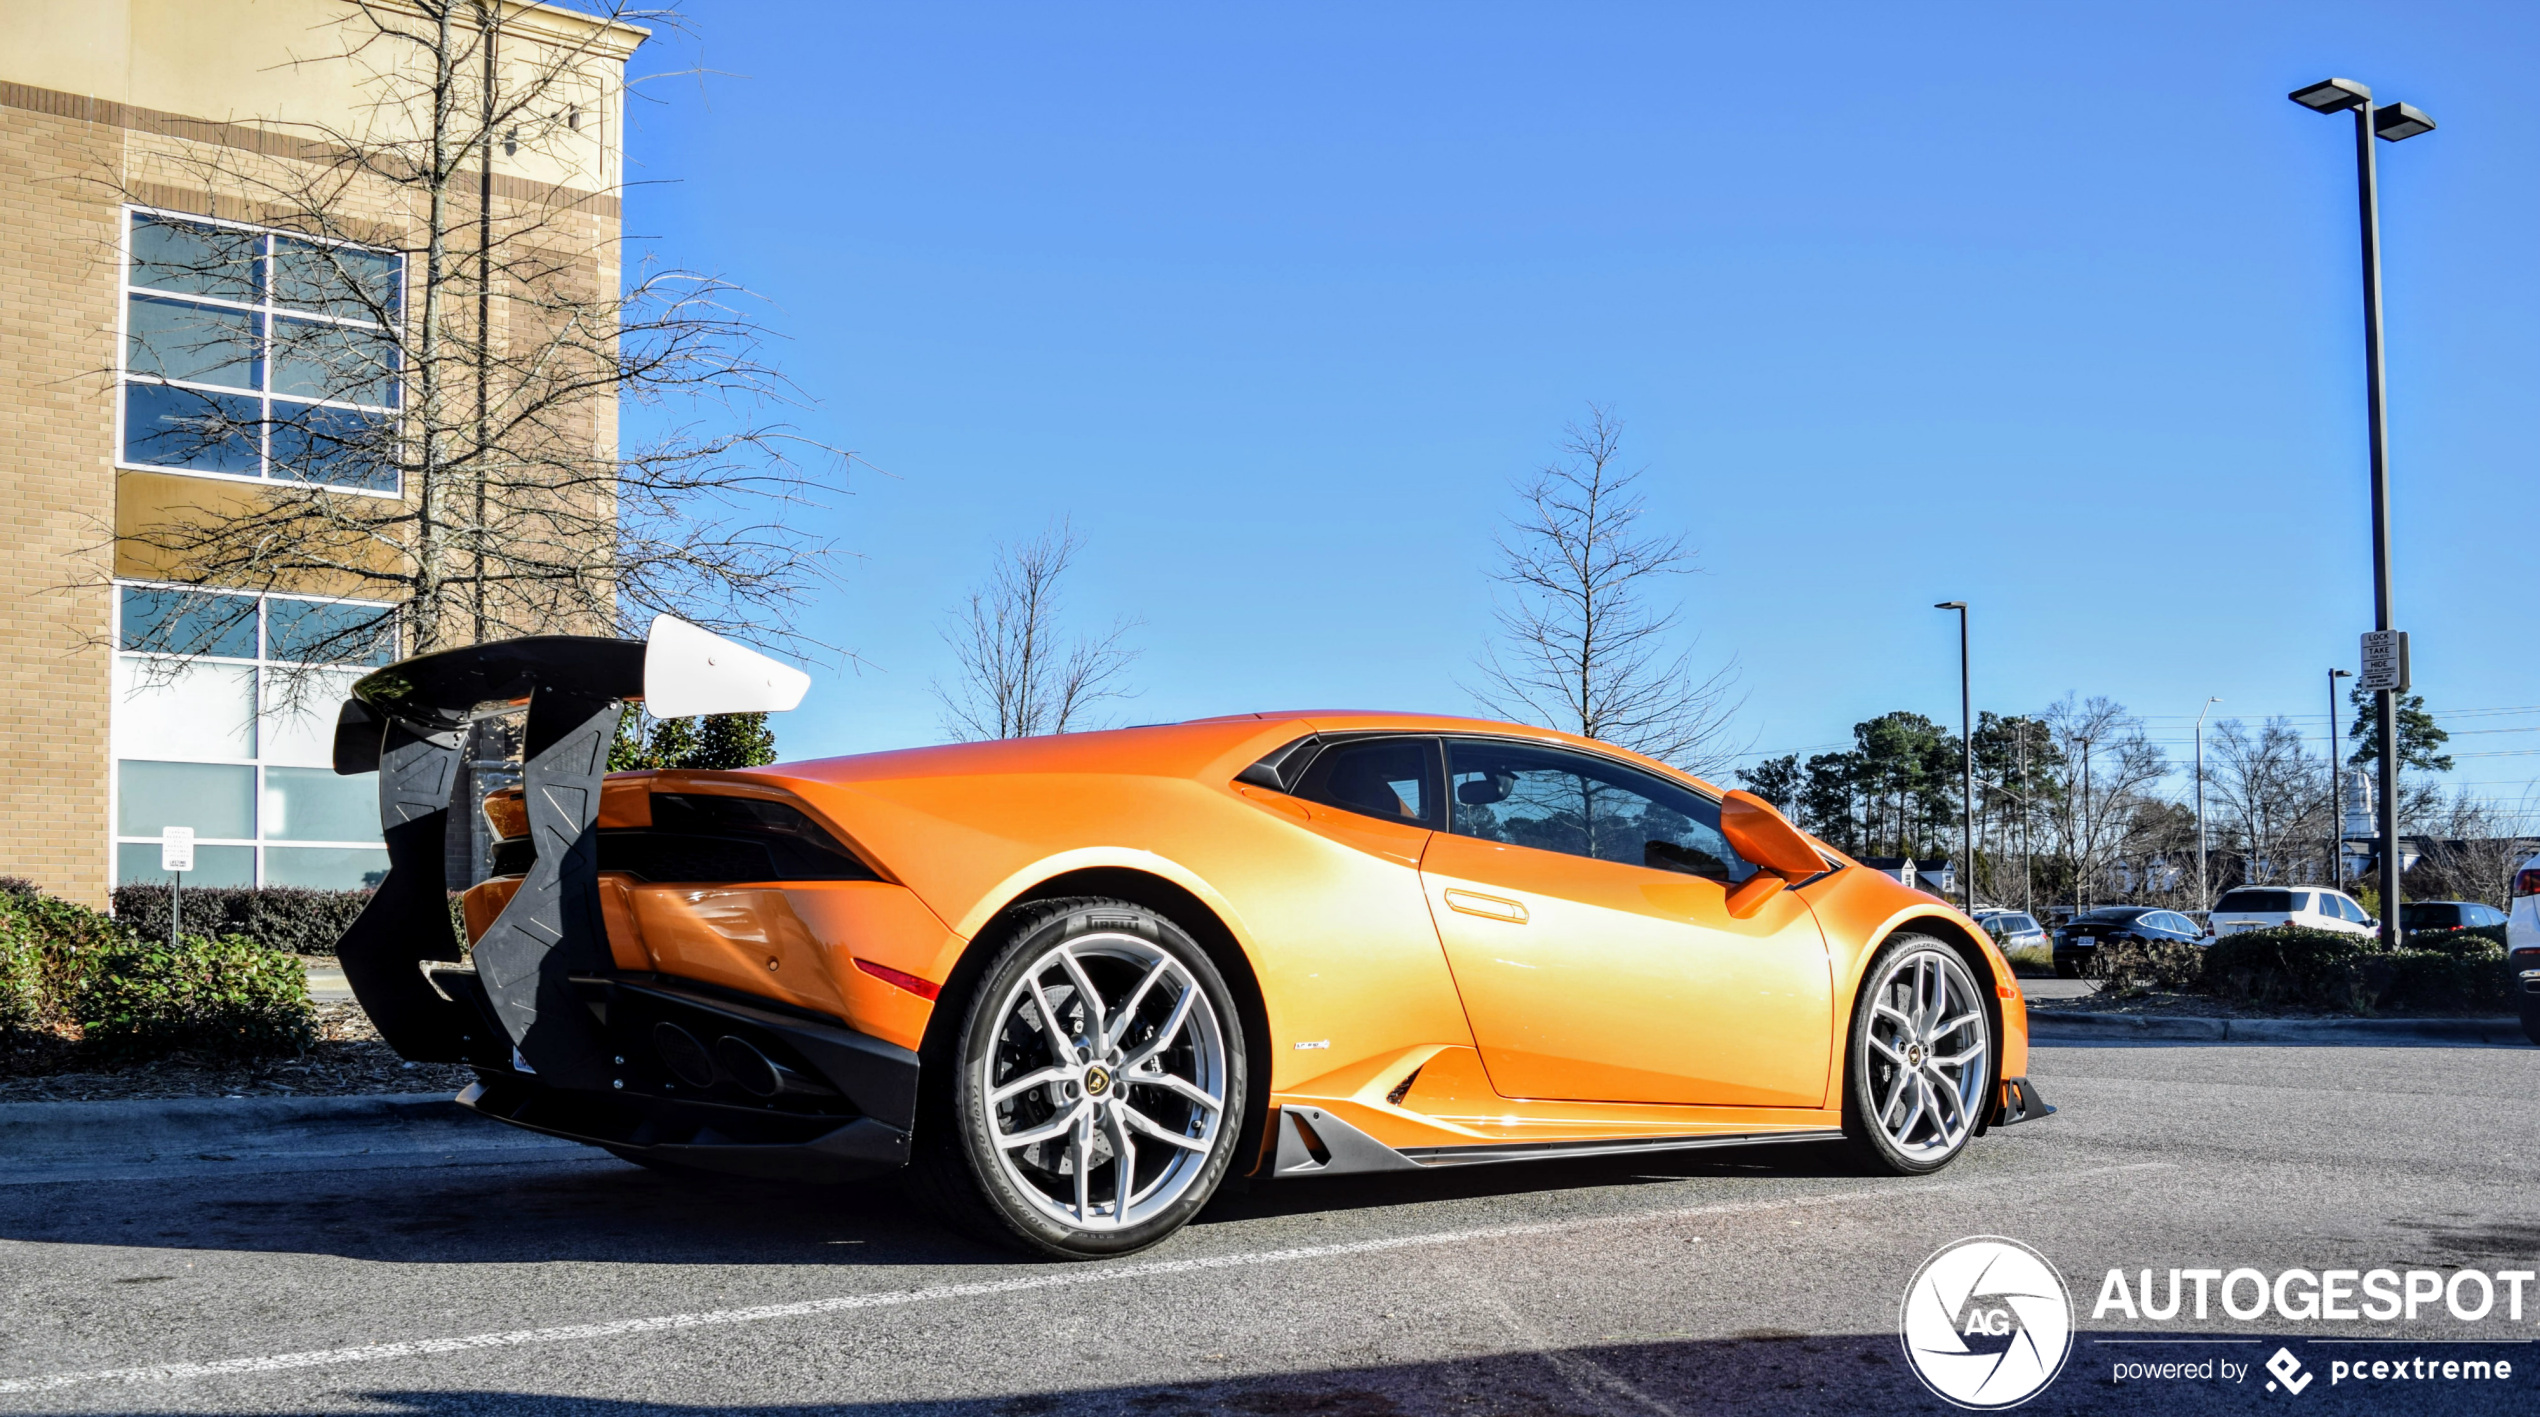 Lamborghini Huracan met identiteitsproblemen